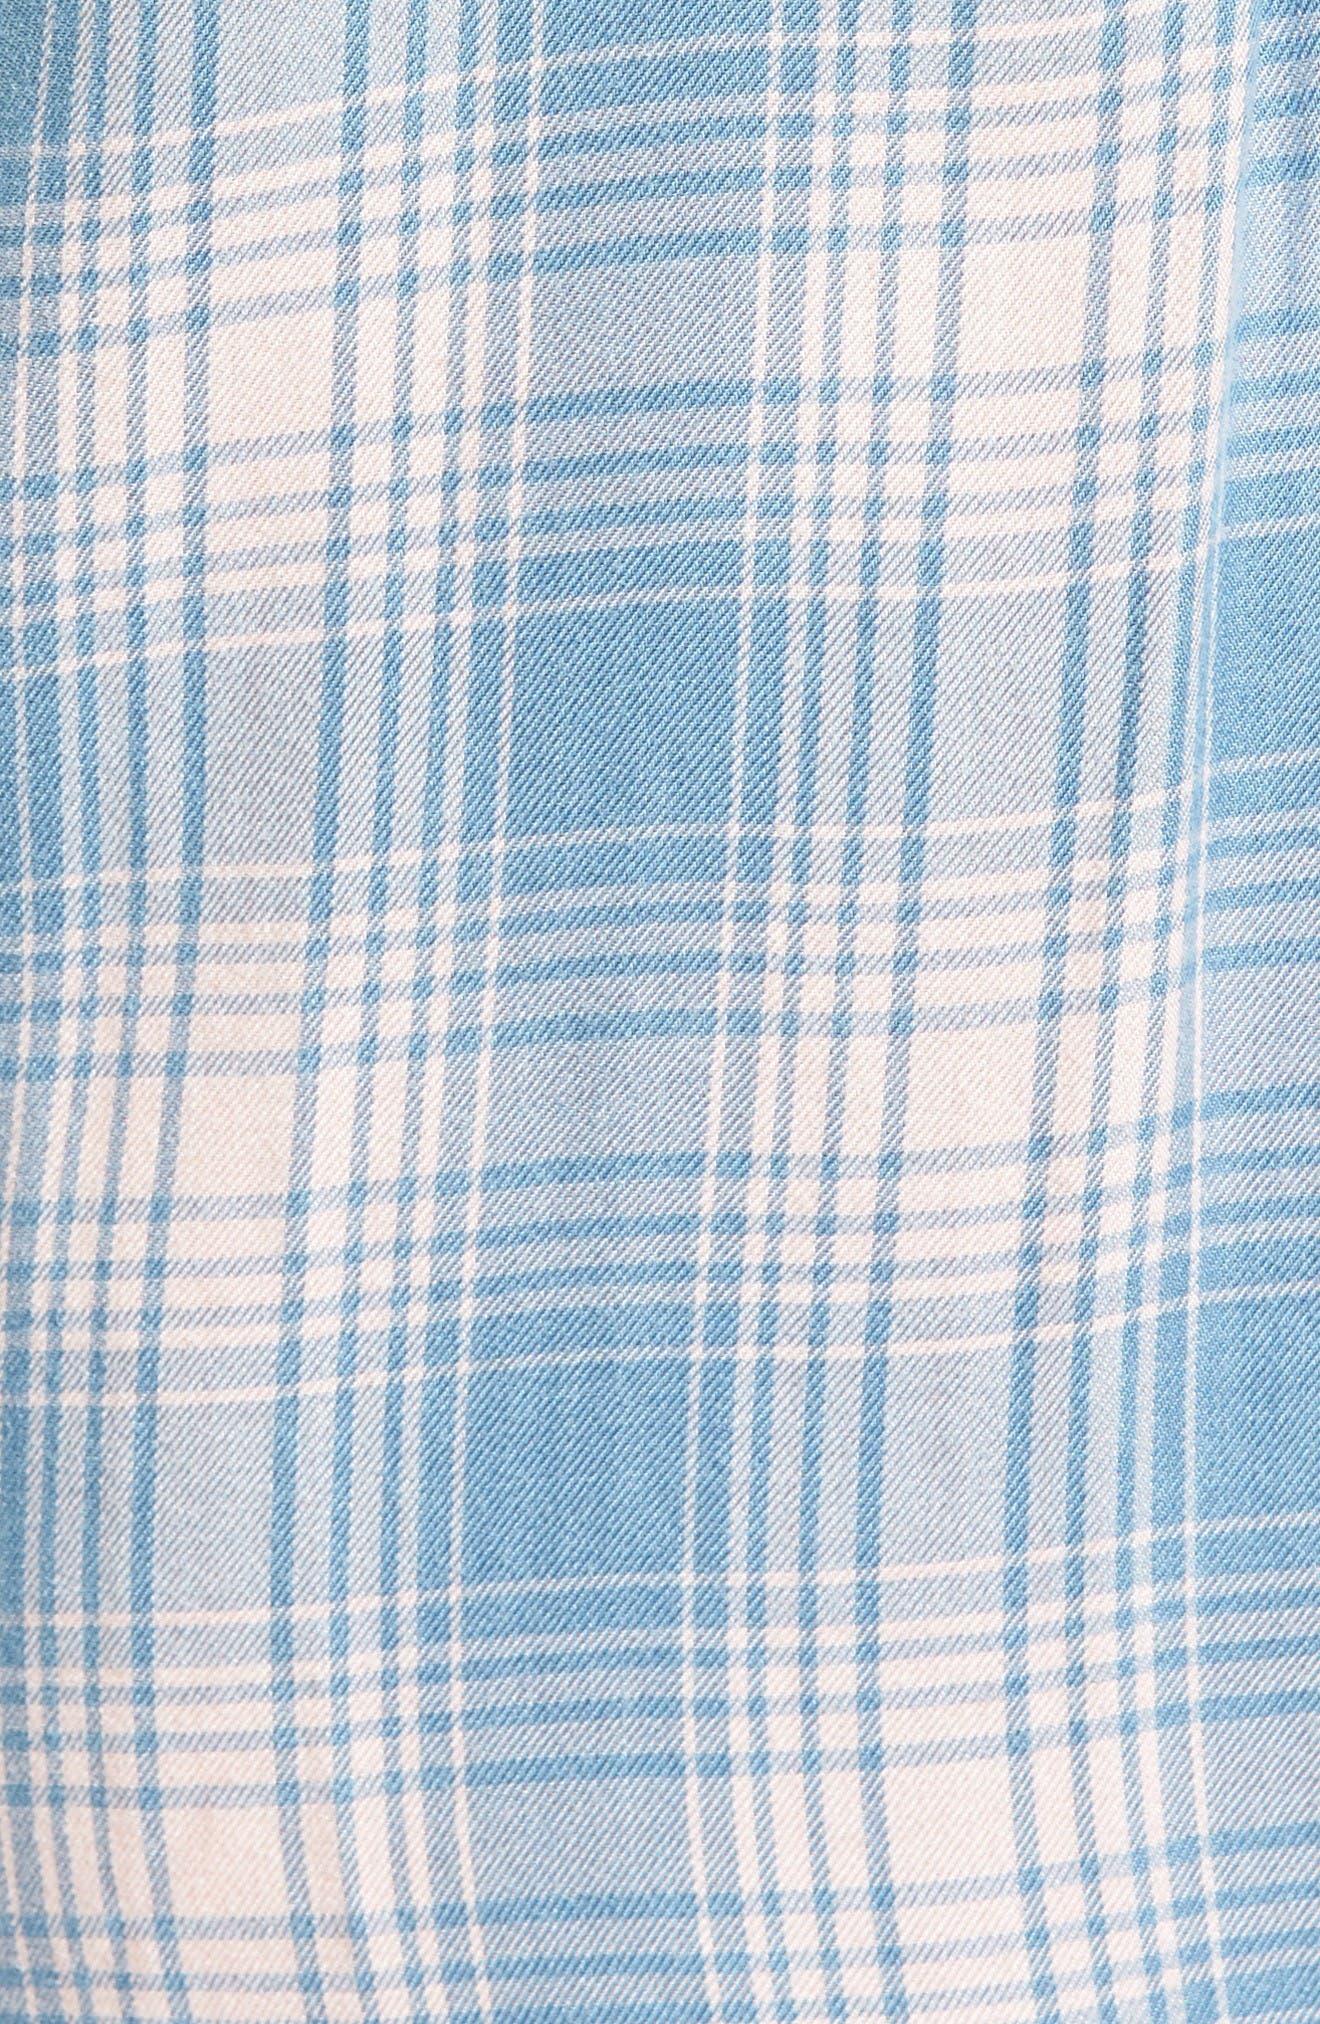 Cold Shoulder Plaid Shirtdress,                             Alternate thumbnail 5, color,                             Pink Plaid